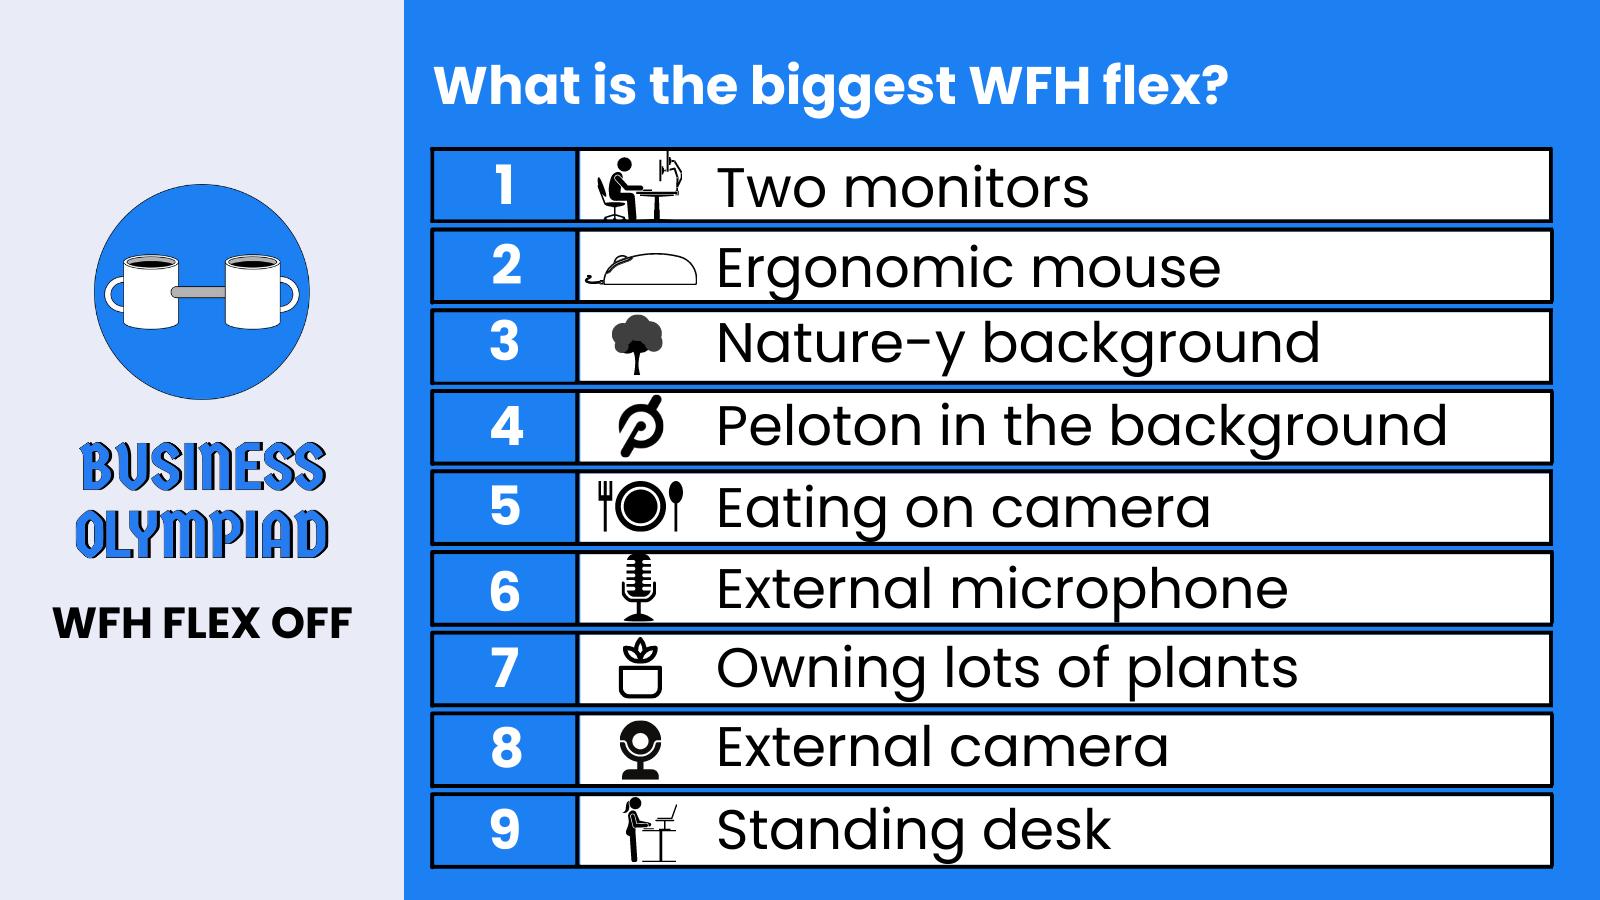 WFH Flex Off leaderboard